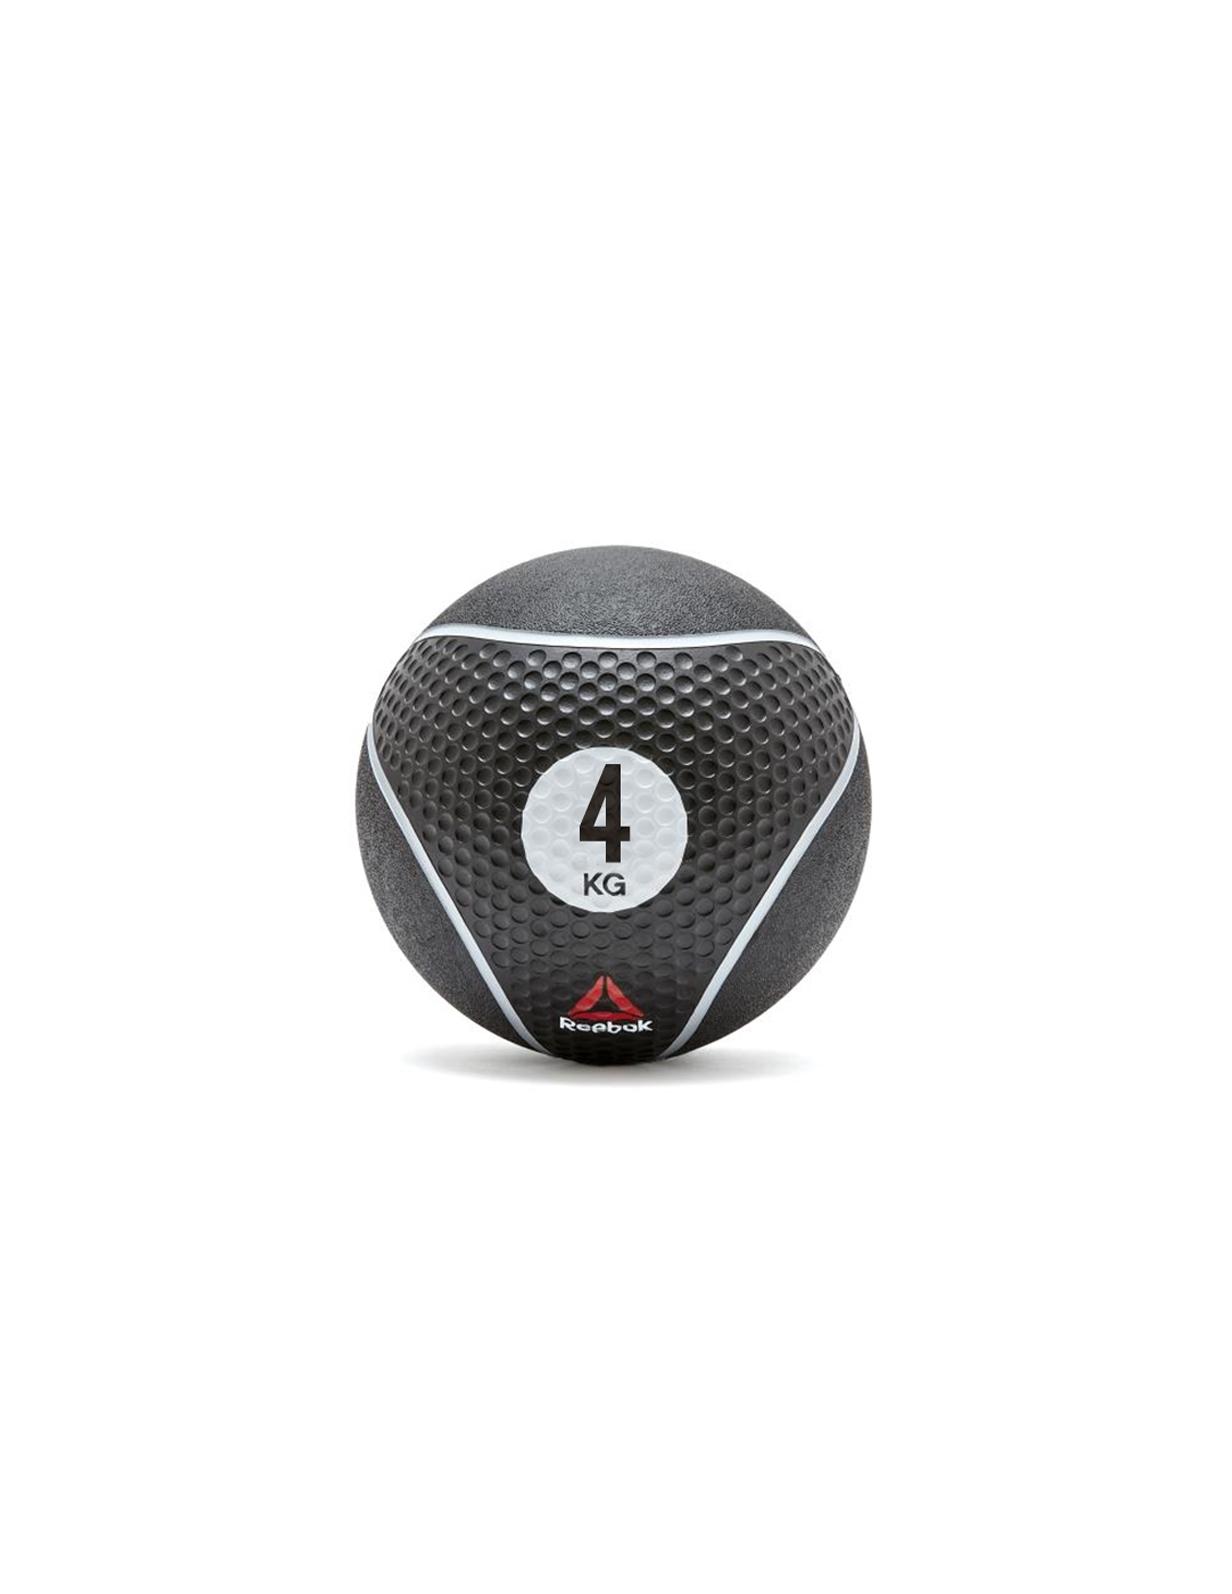 RSB-16054 Medicine Ball - 4Kg